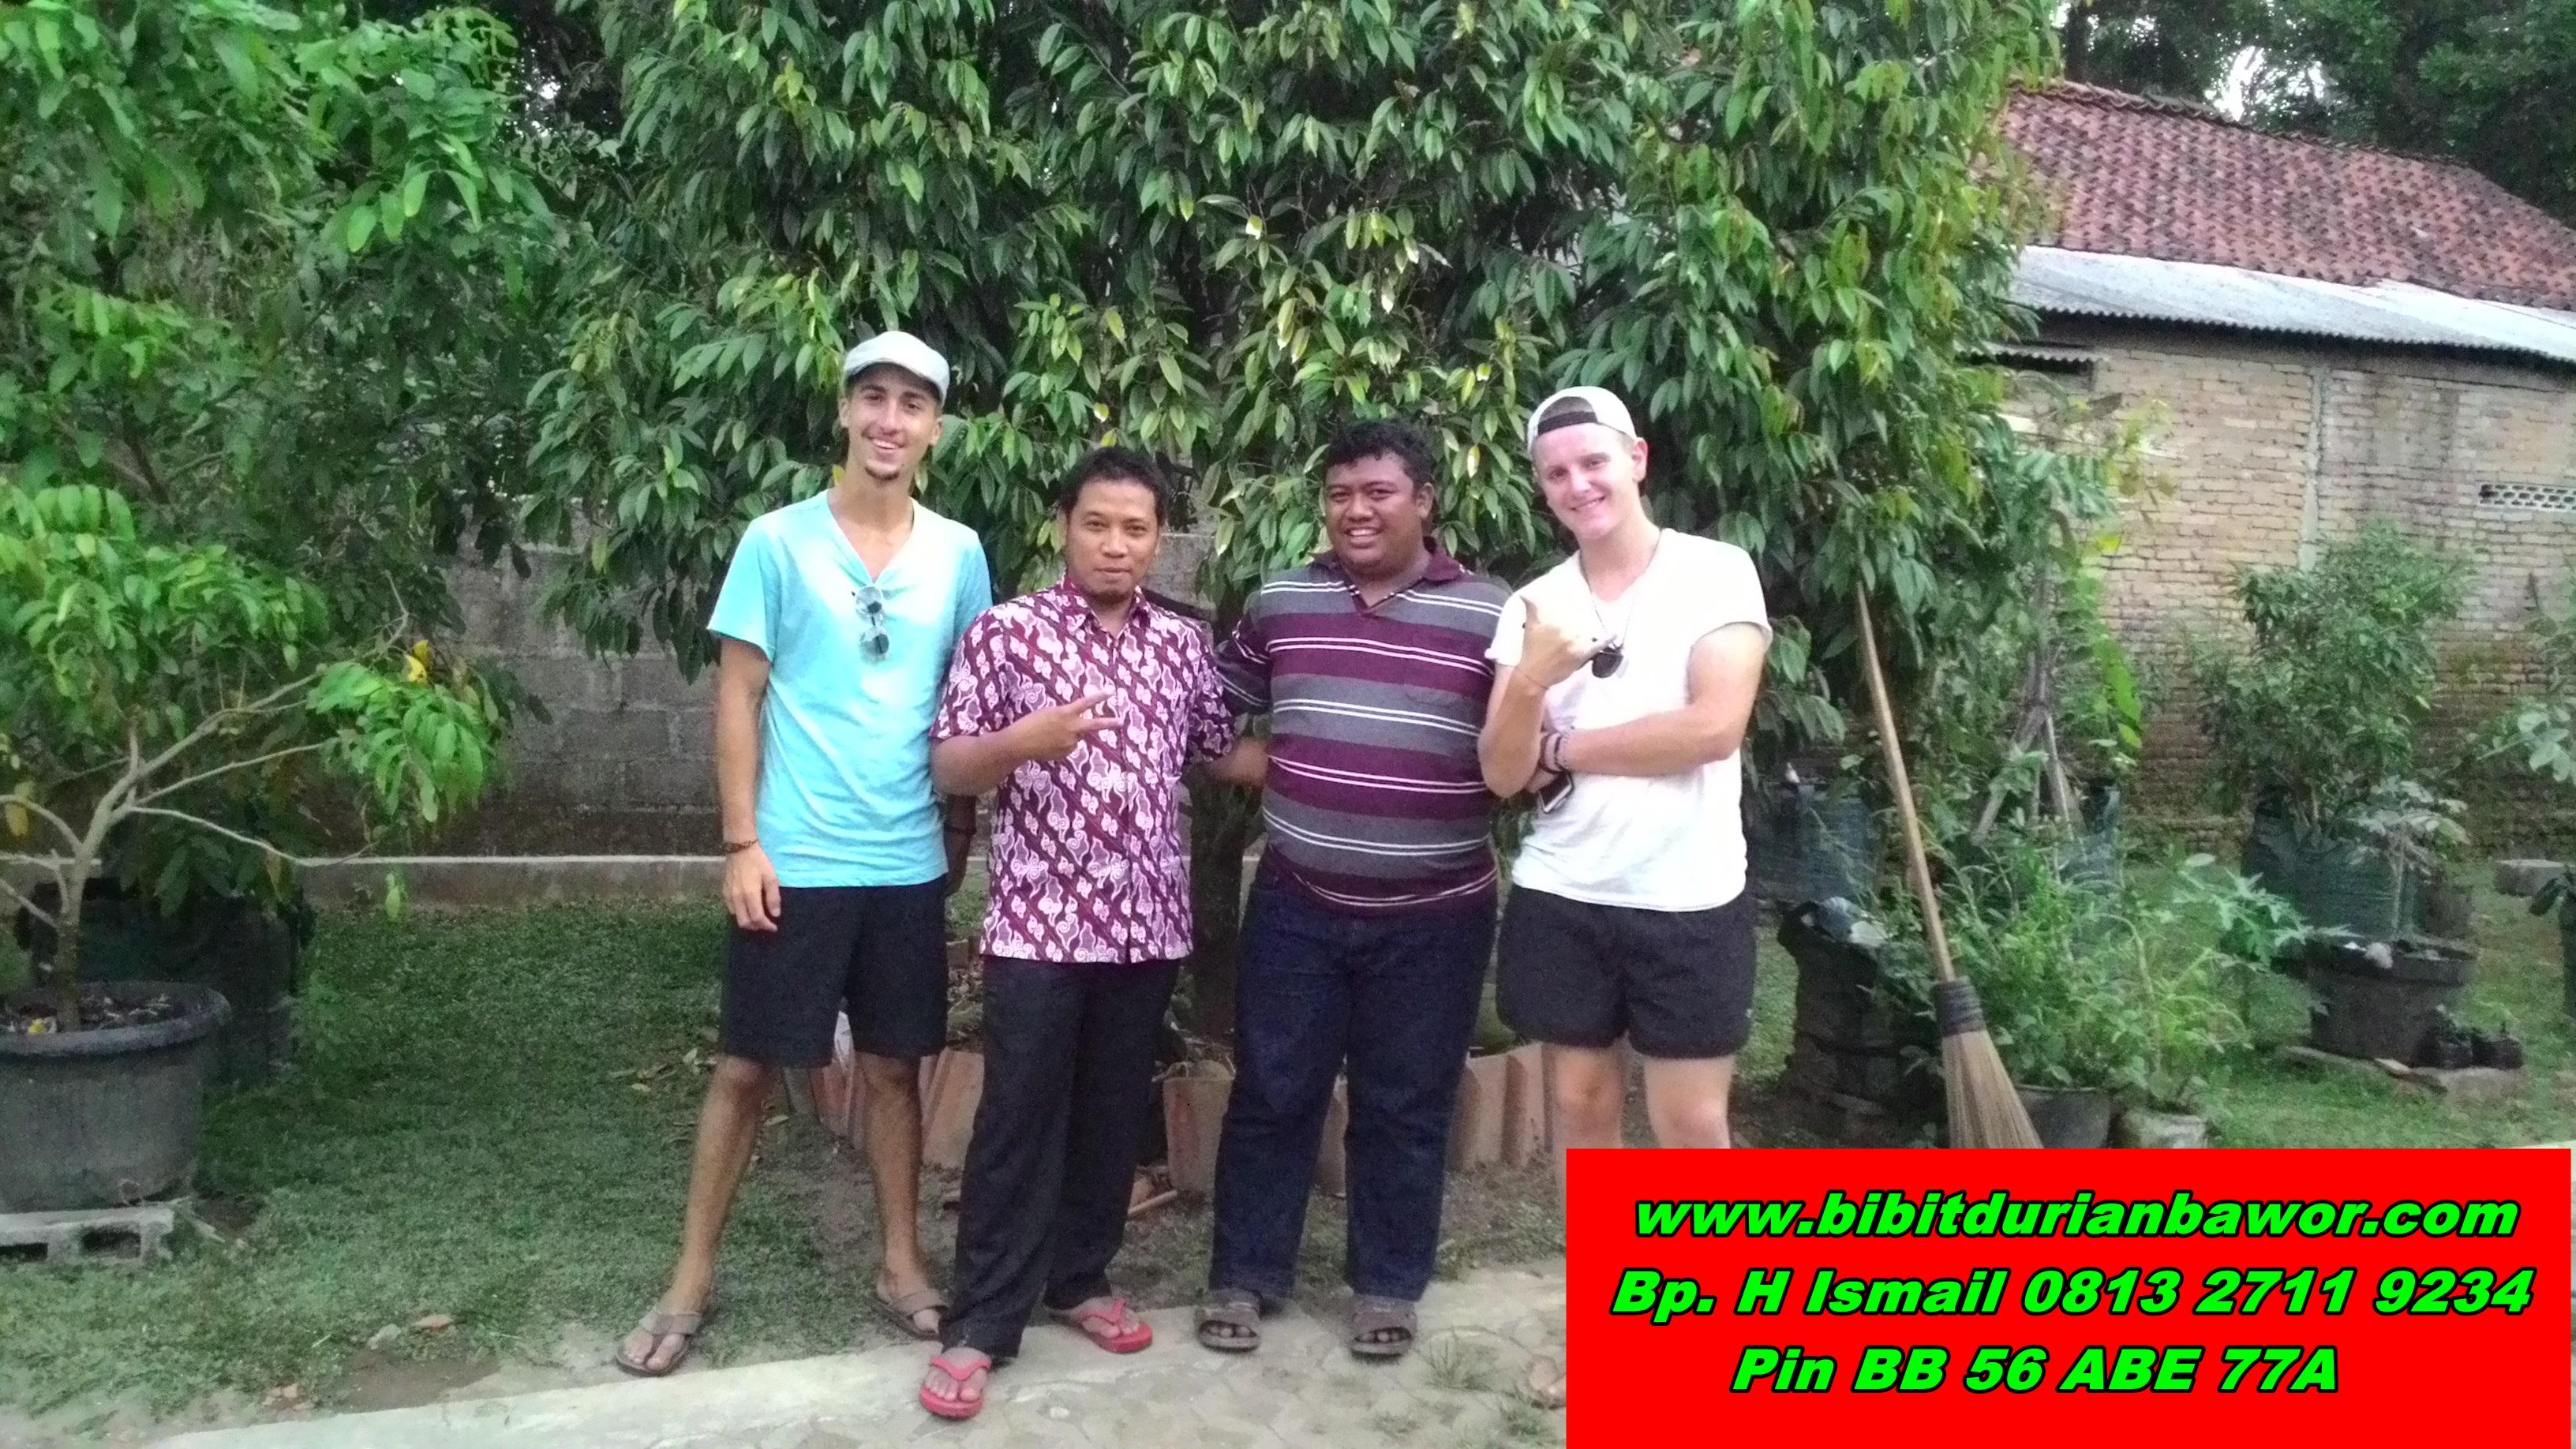 Bibit Durian H Tovix TERPERCAYA